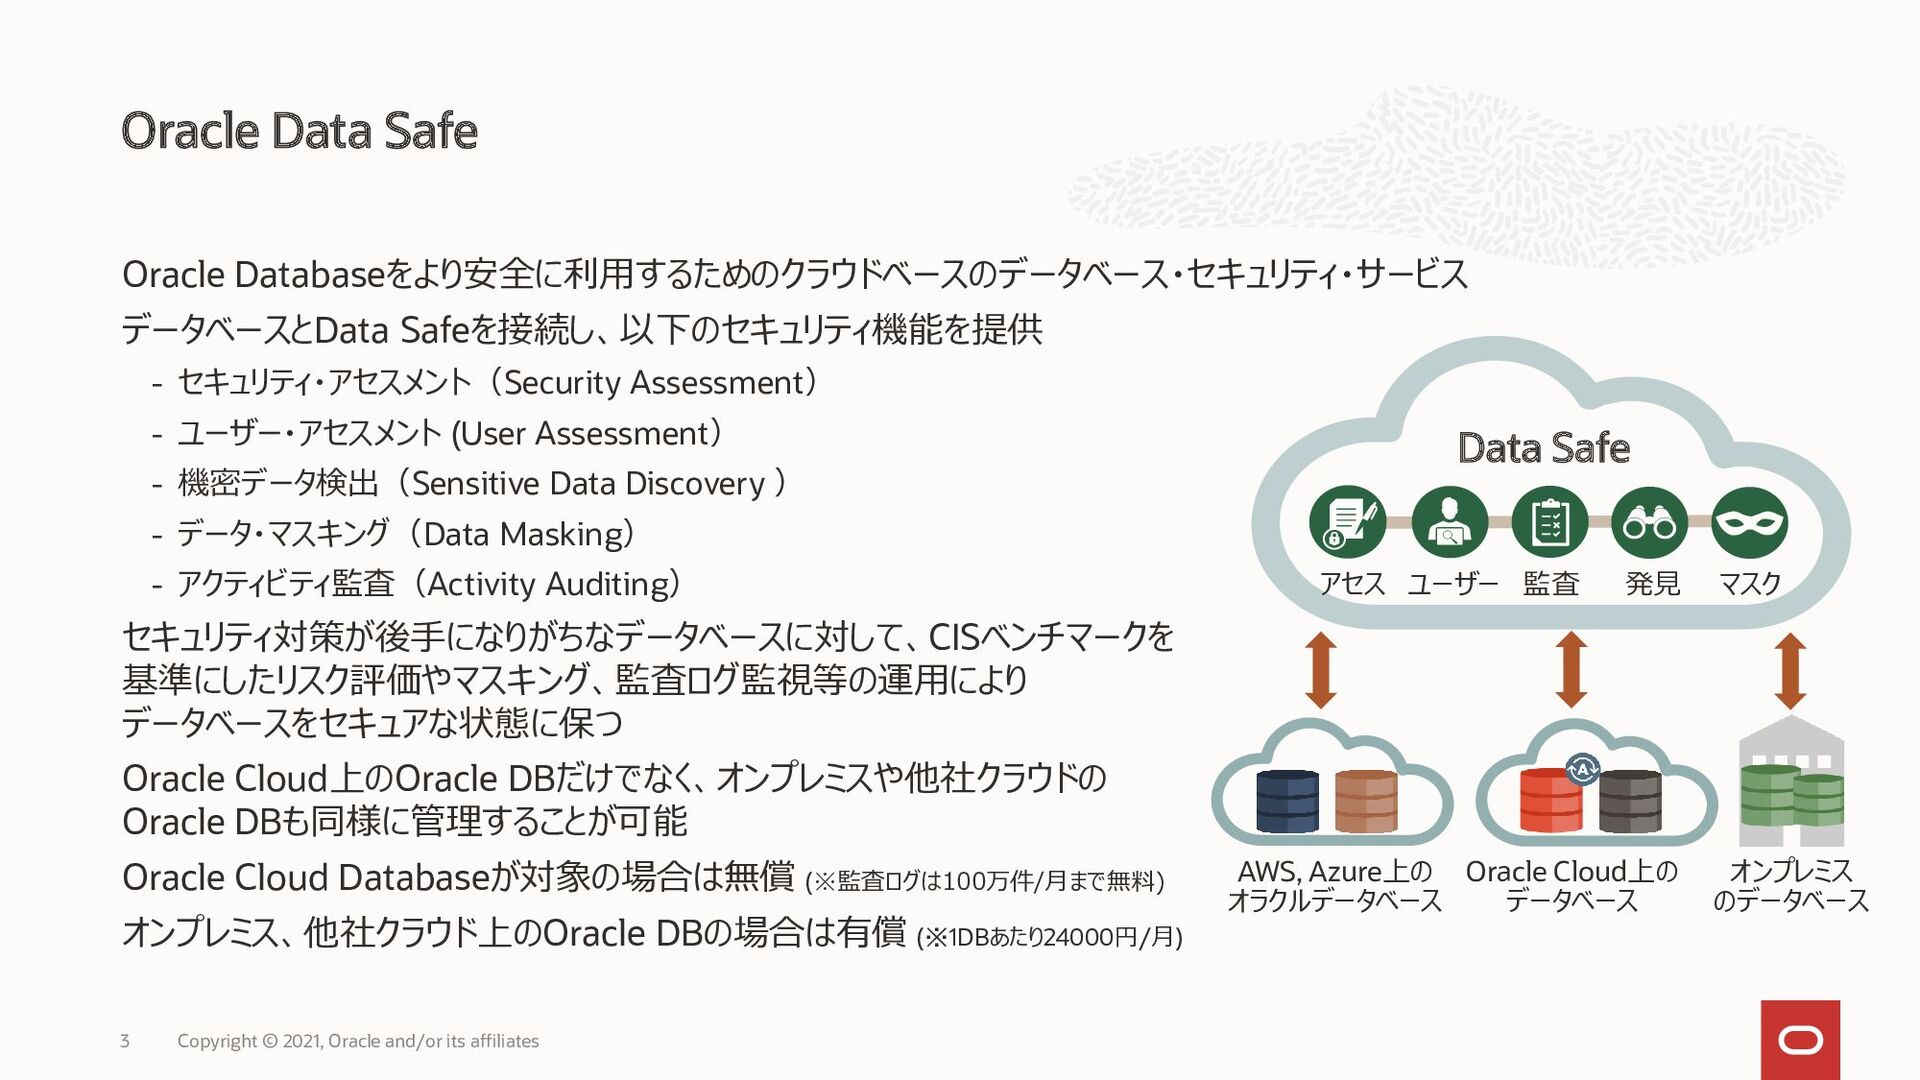 Oracle Data Safe 統合されたOracle Databaseのセキュリティ管理サ...